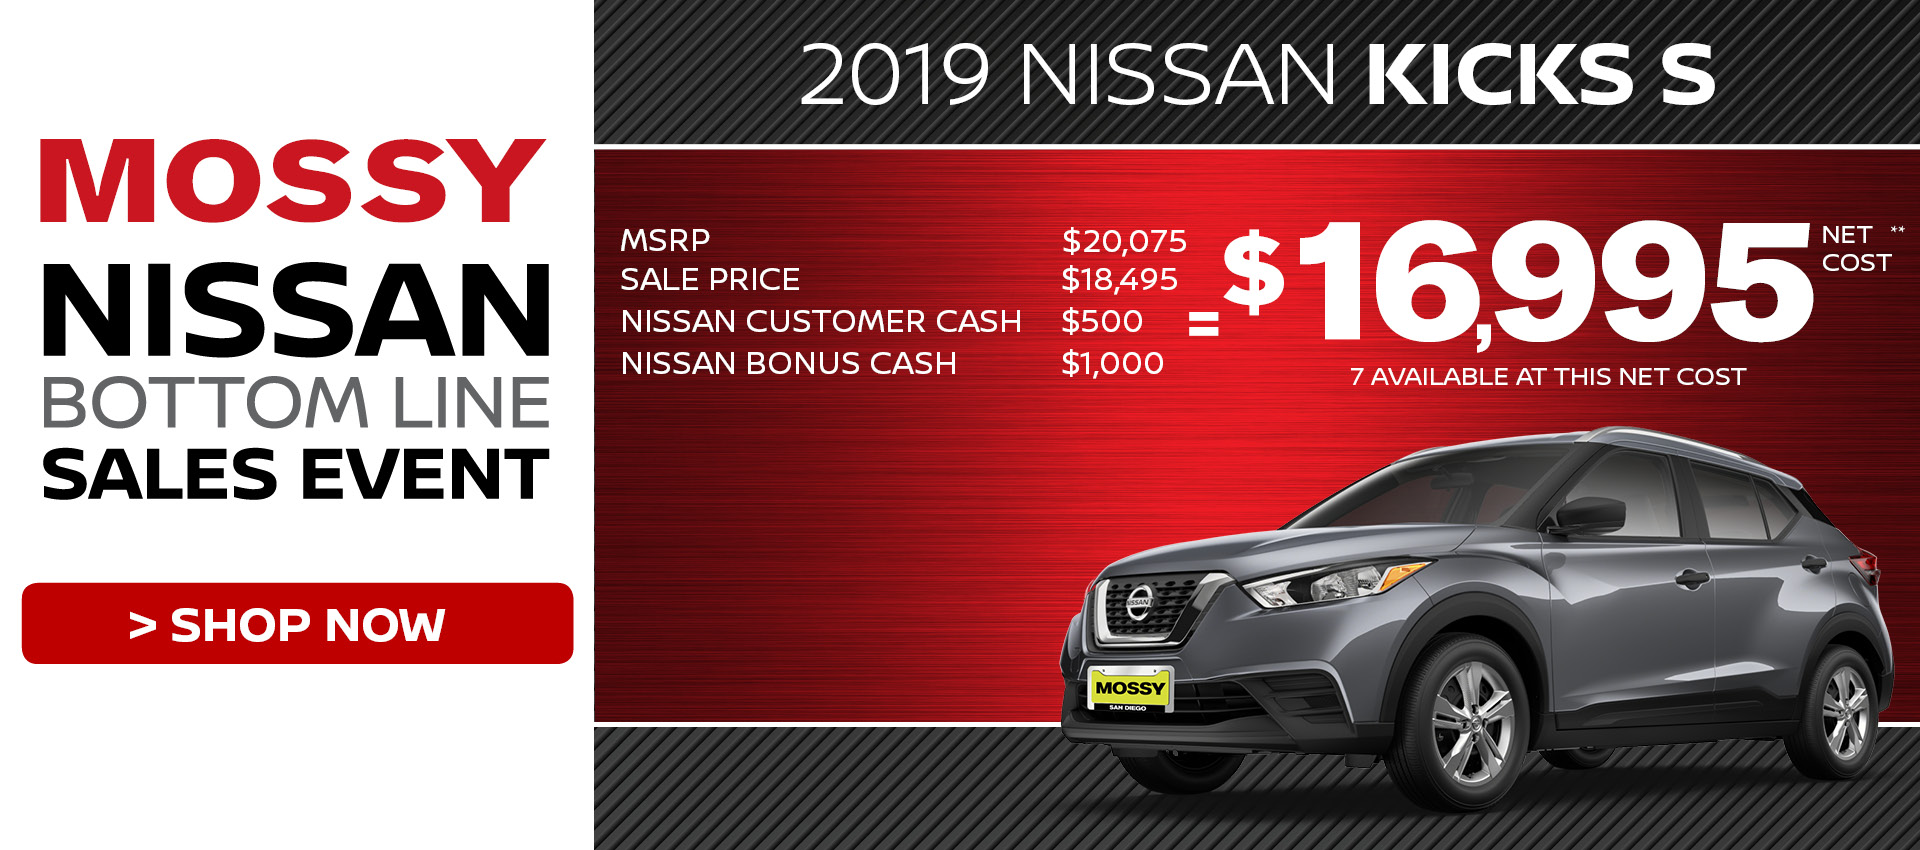 Mossy Nissan - Nissan Kicks $16,995 Purchase HP